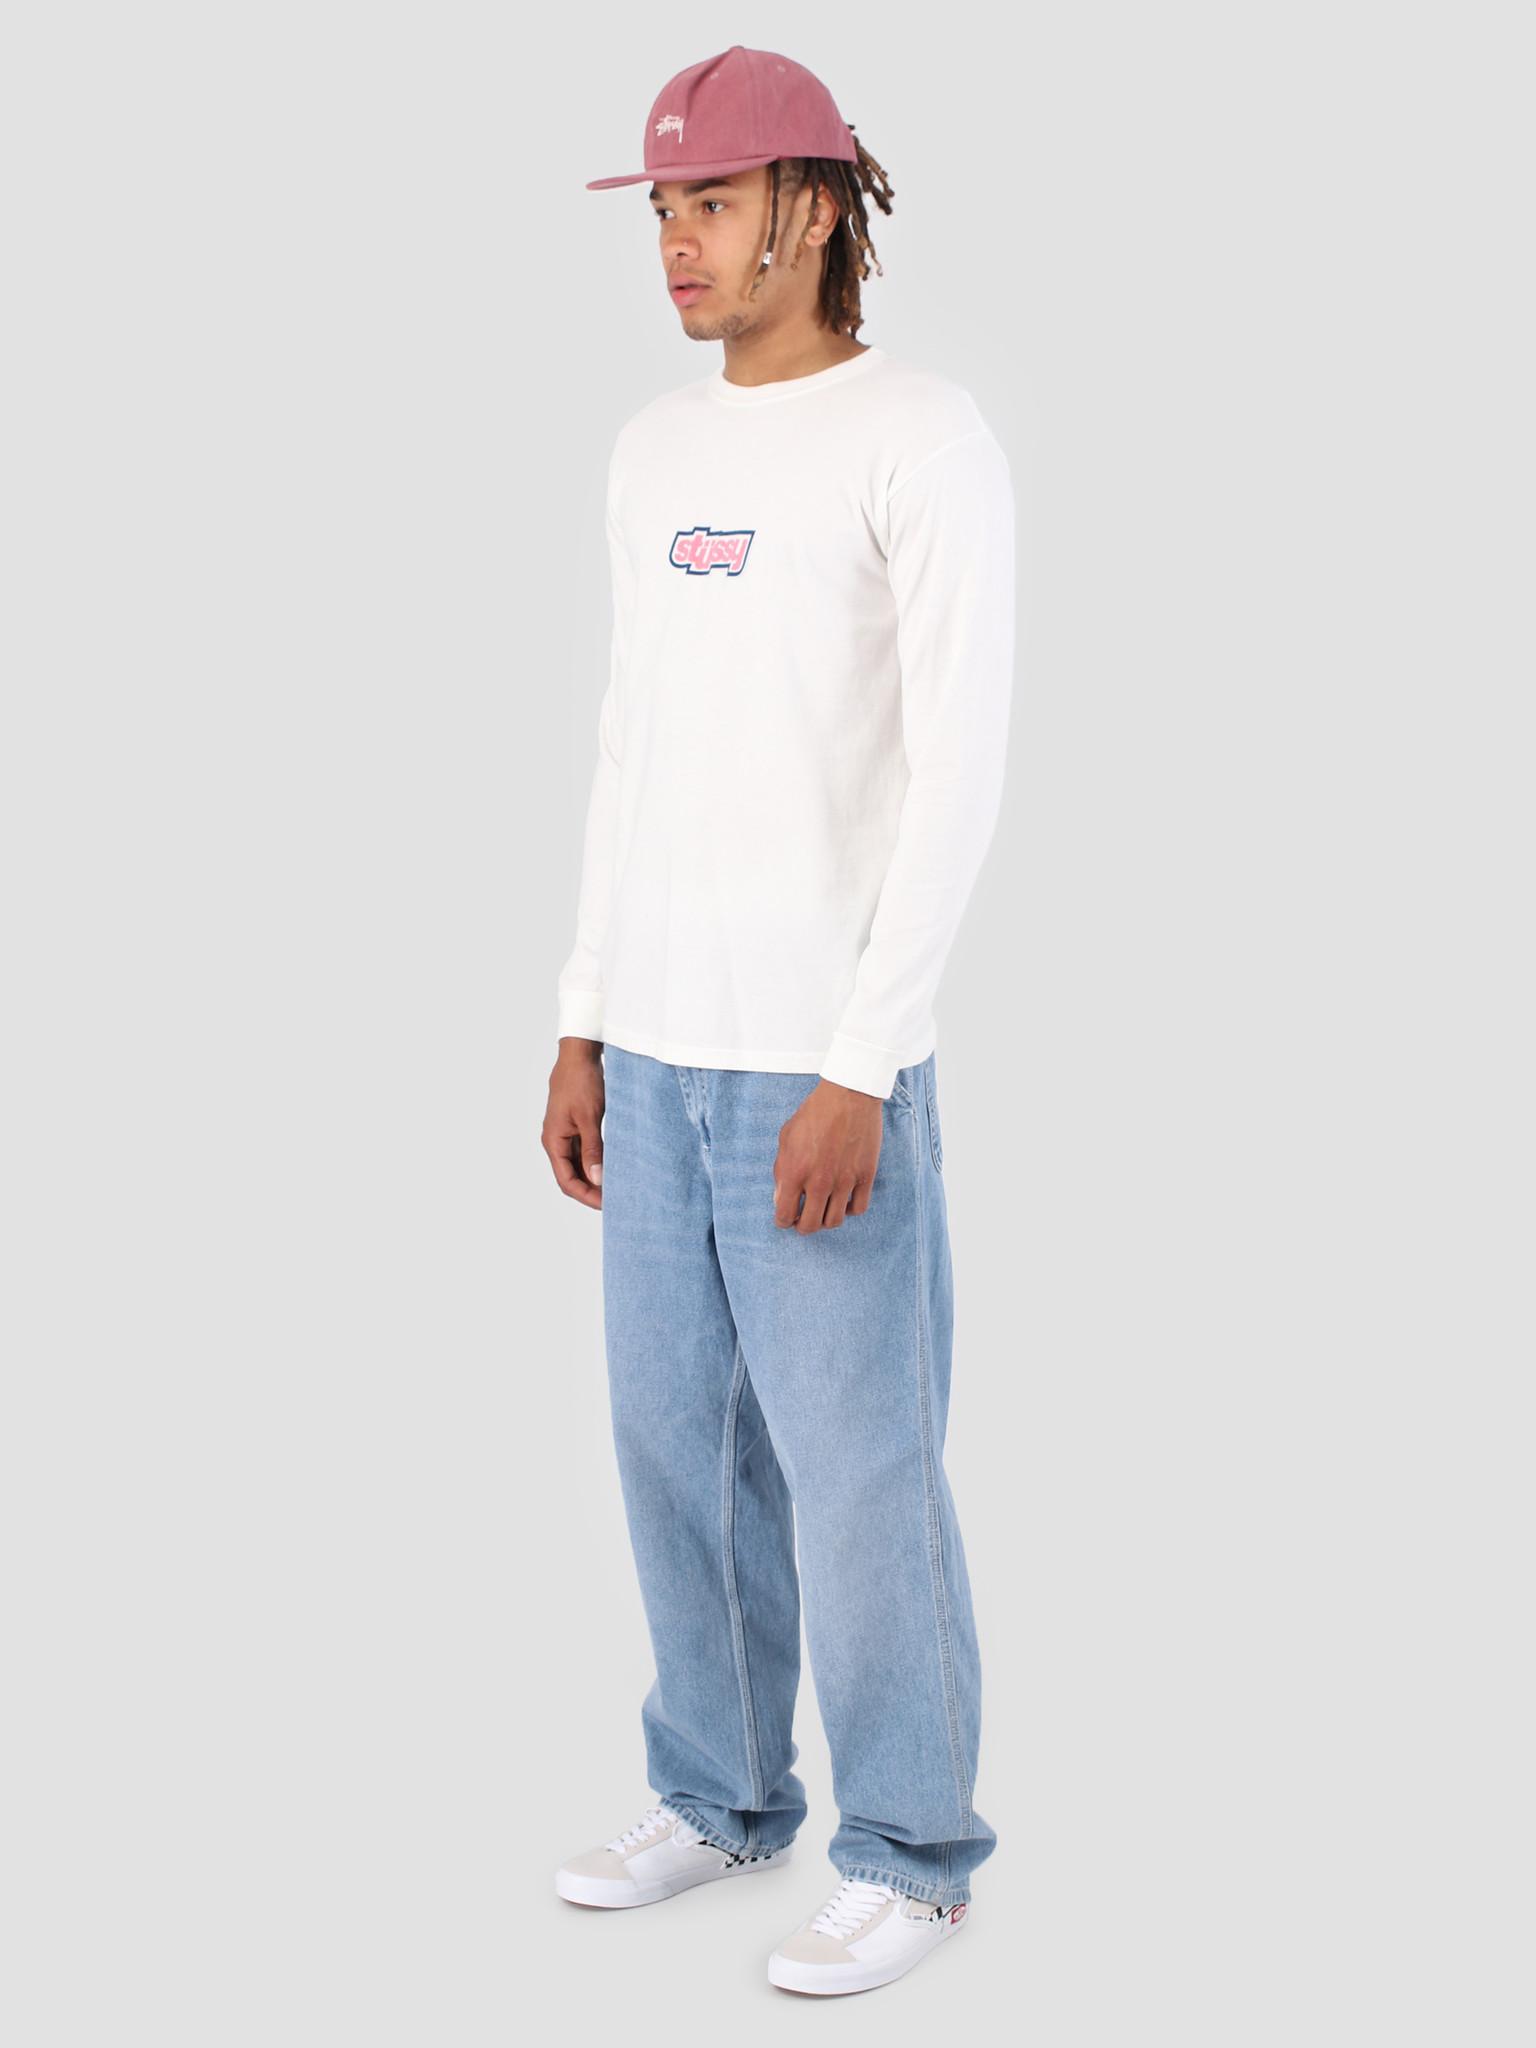 Stussy Stussy Drop U Pig. Dyed Longsleeve T-Shirt Natural 1002